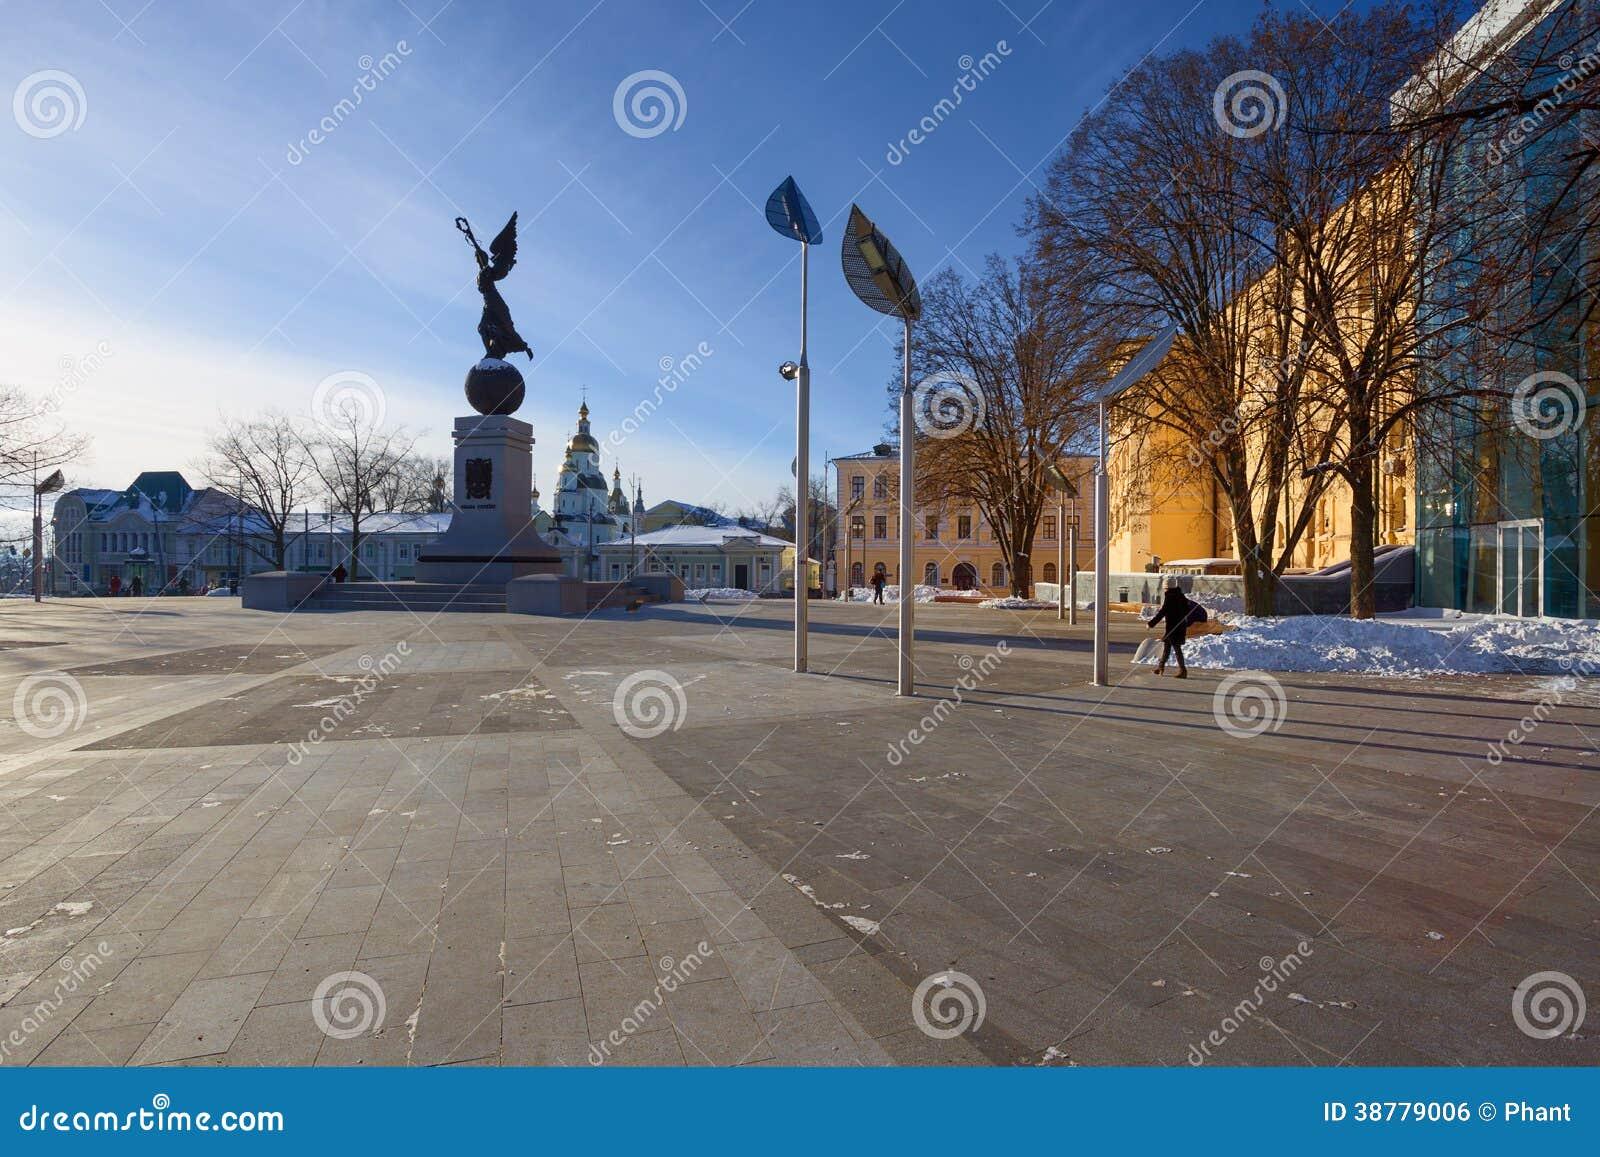 Kwadrat w Kharkov. Ukraina.